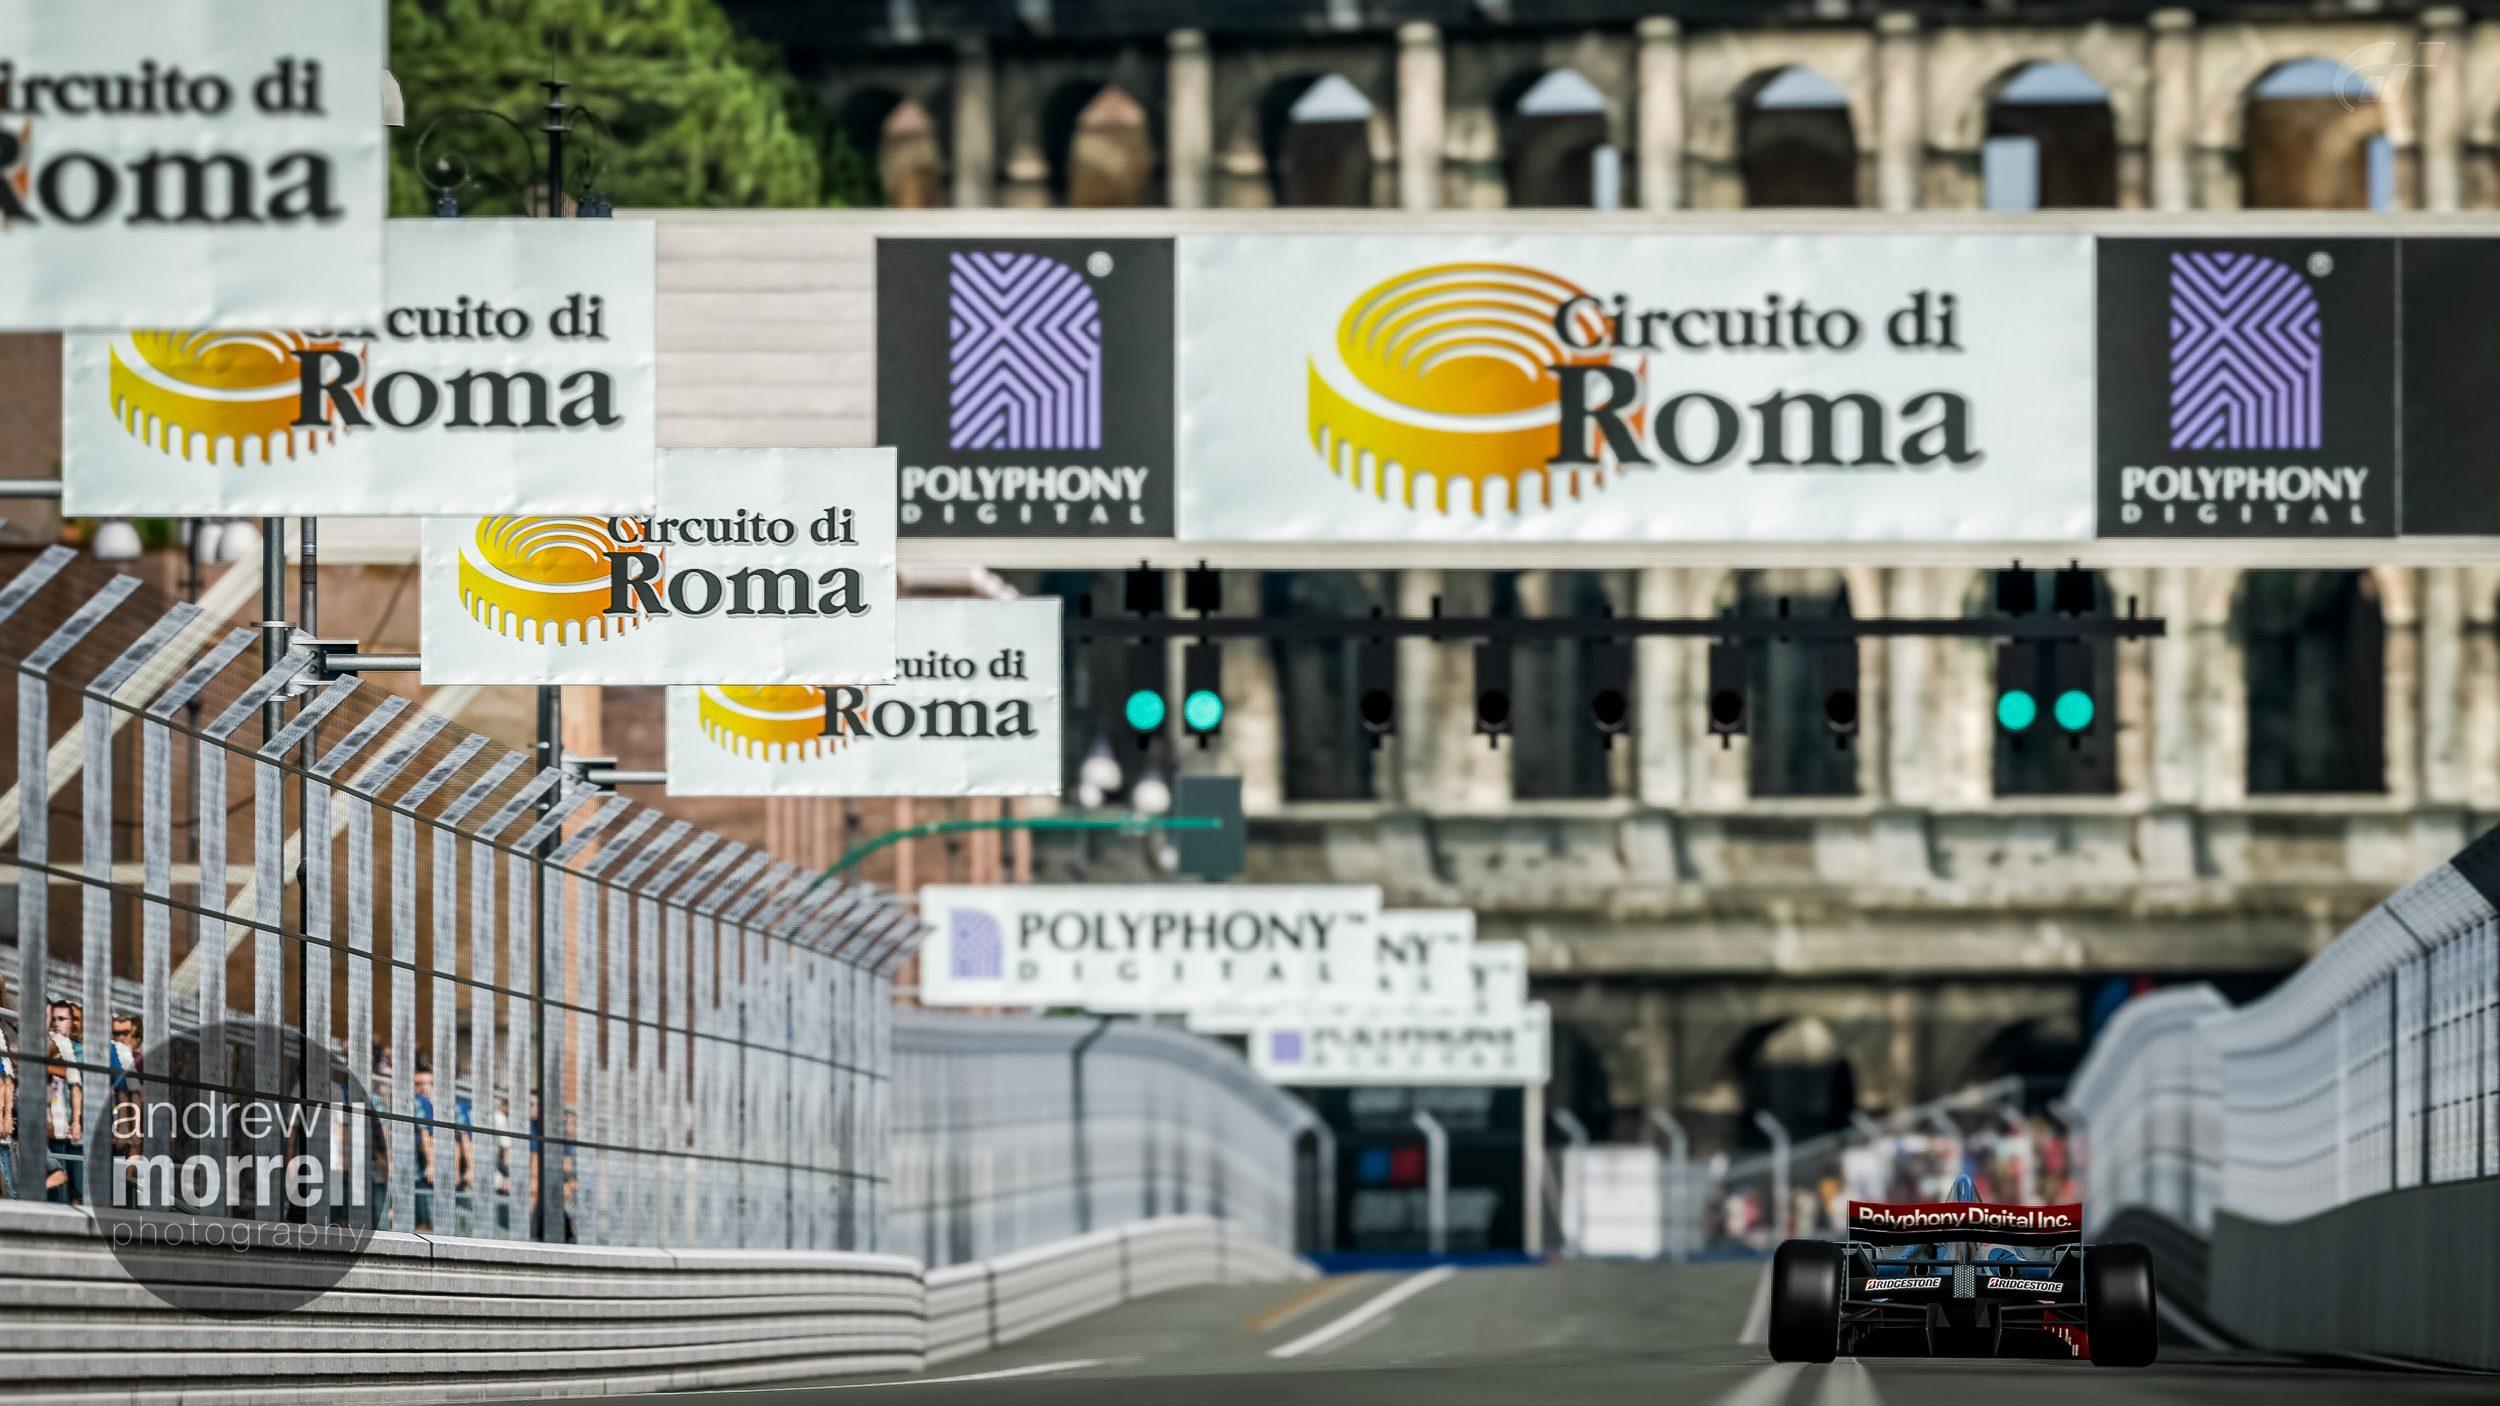 Circuito di Roma_14.jpg